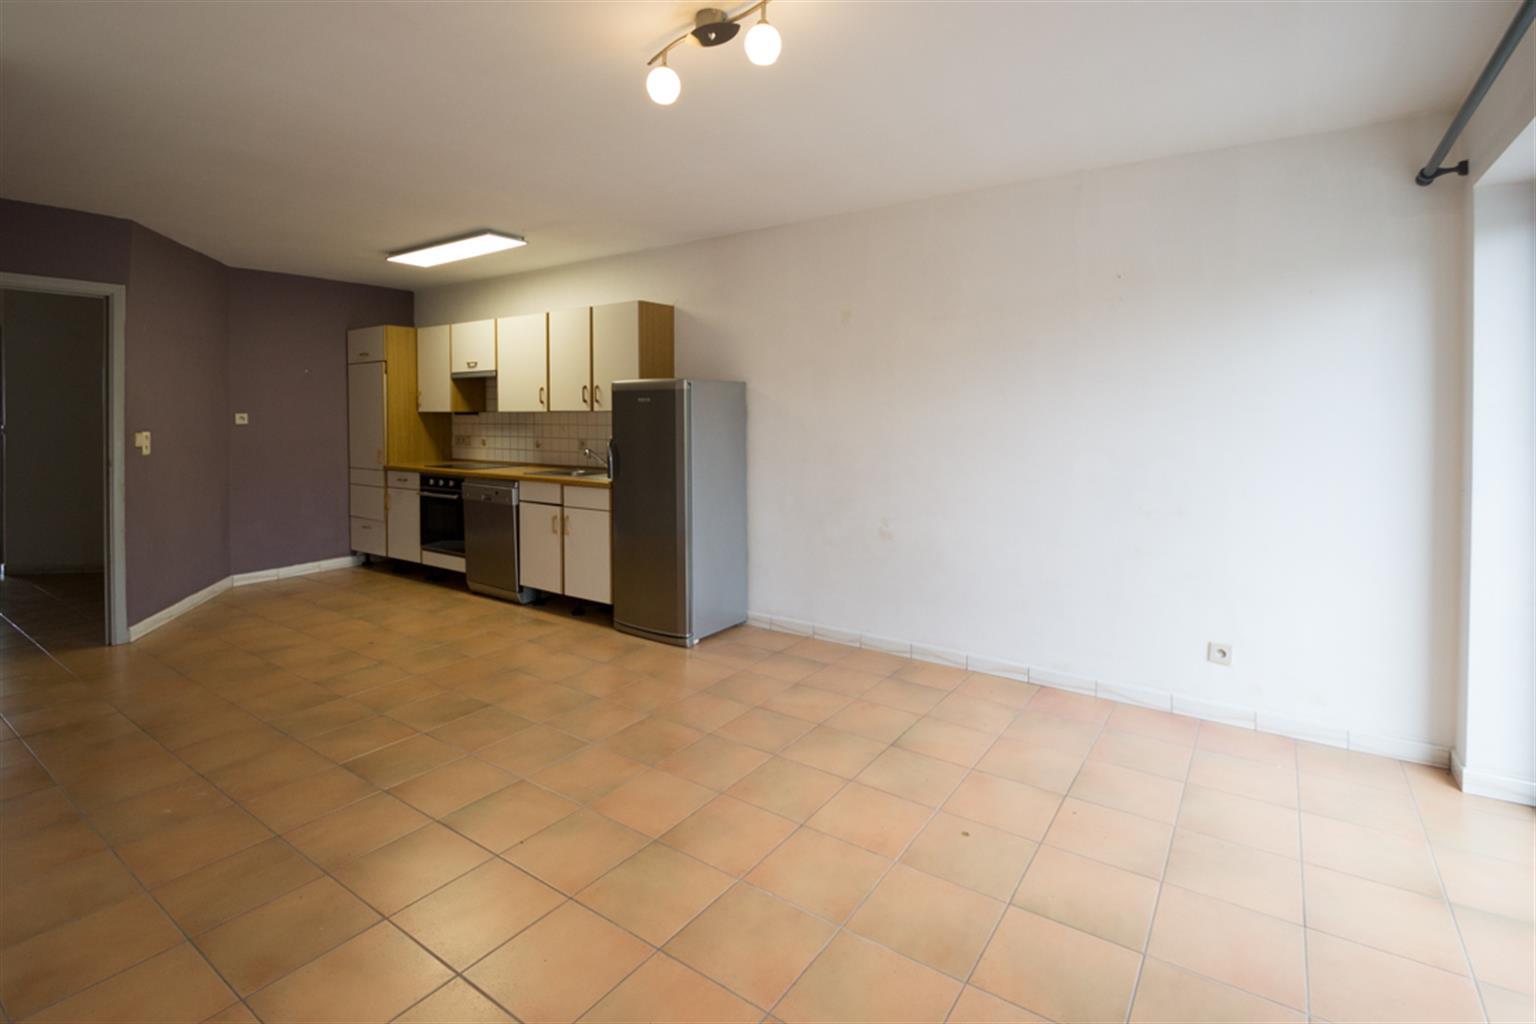 Appartement - Morlanwelz - #4197669-3